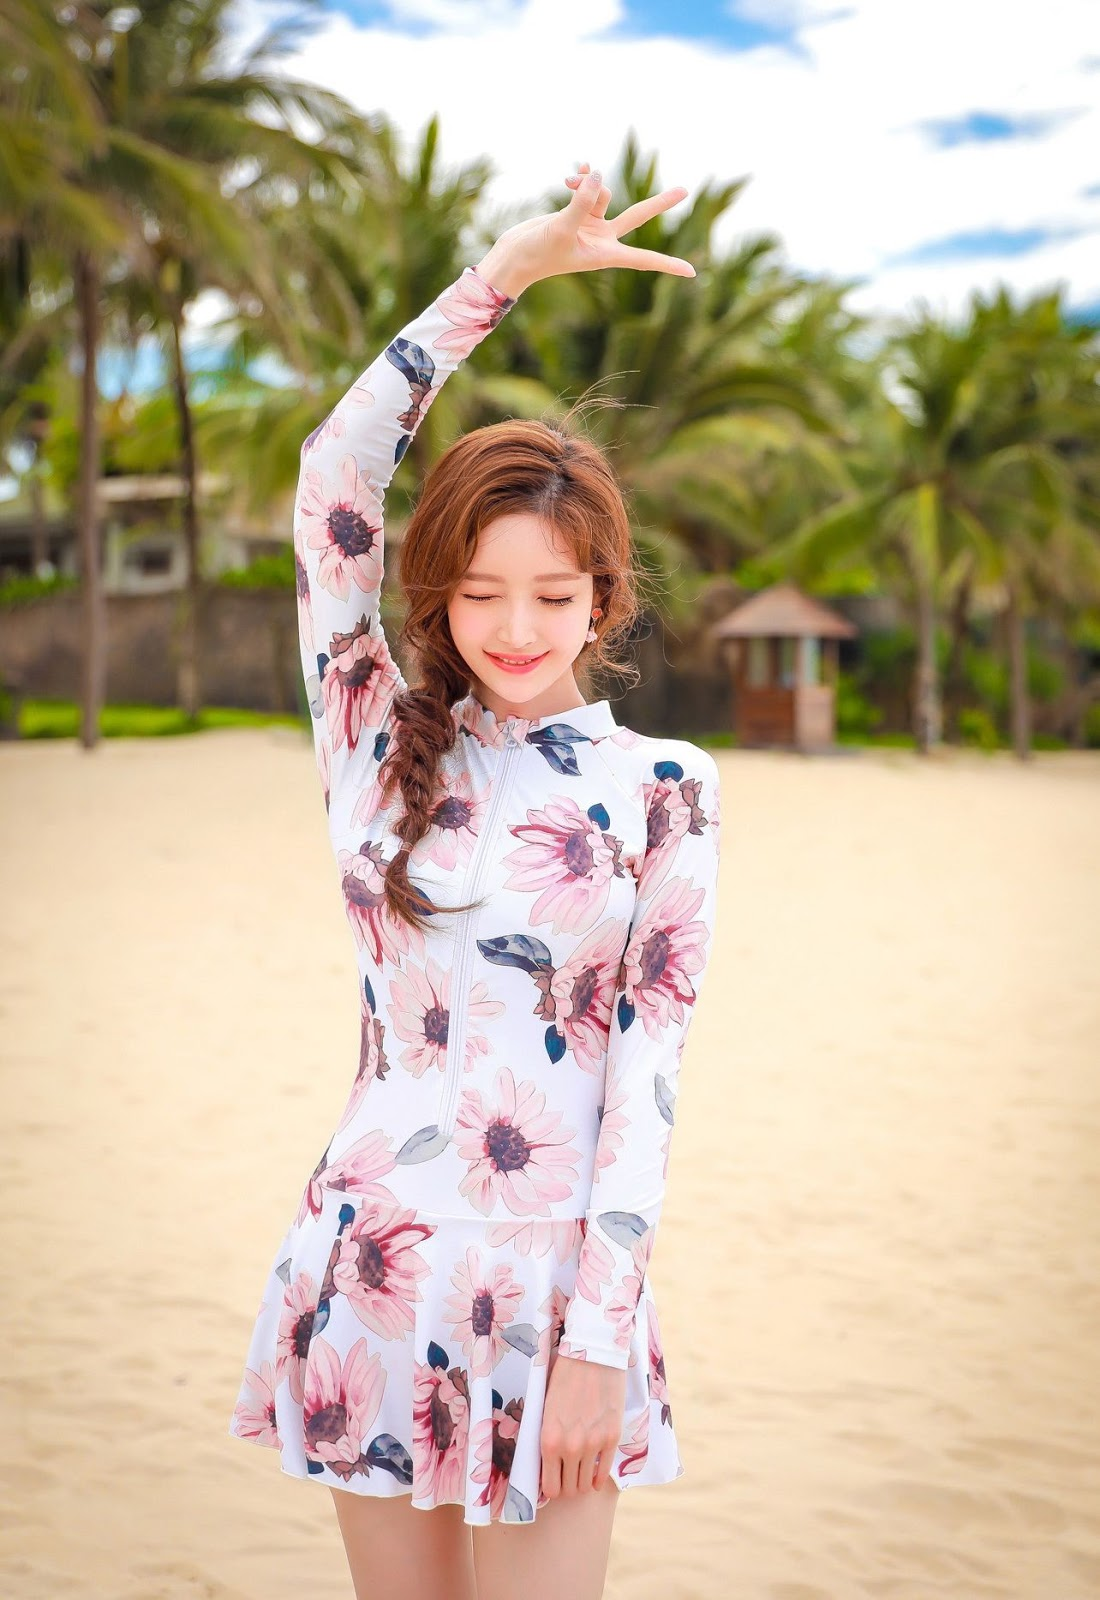 Image Korean Fashion Model - Kim Hee Jeong - Pink Fantasy Flamingo Swimsuit - TruePic.net - Picture-8